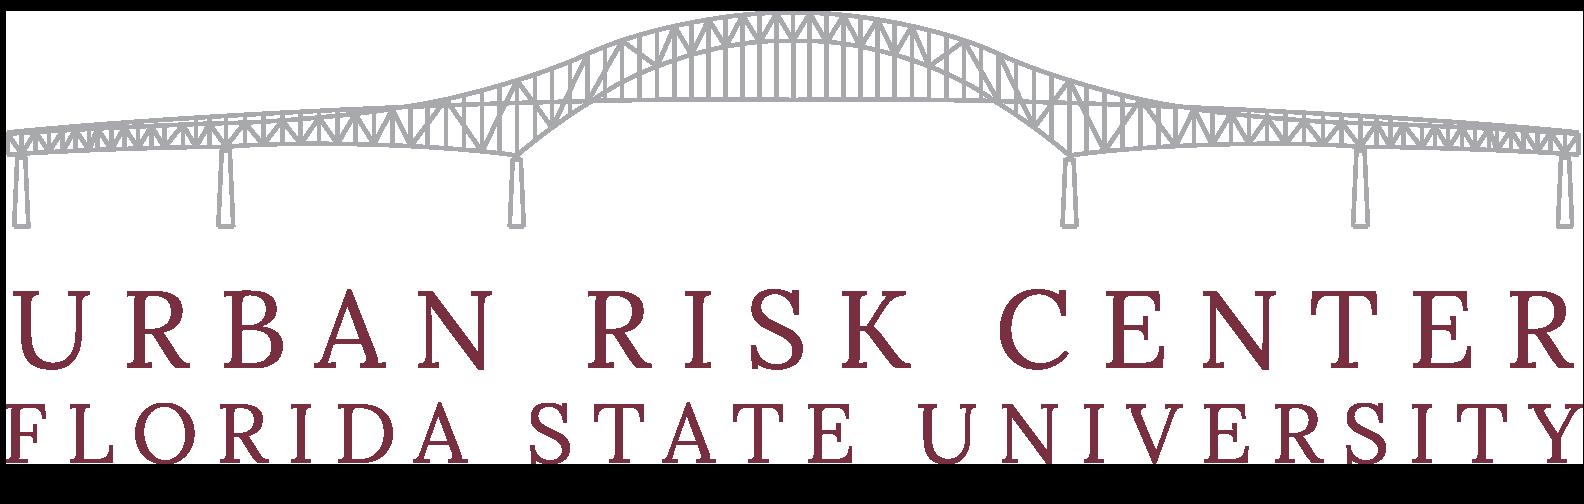 Urban Risk Center